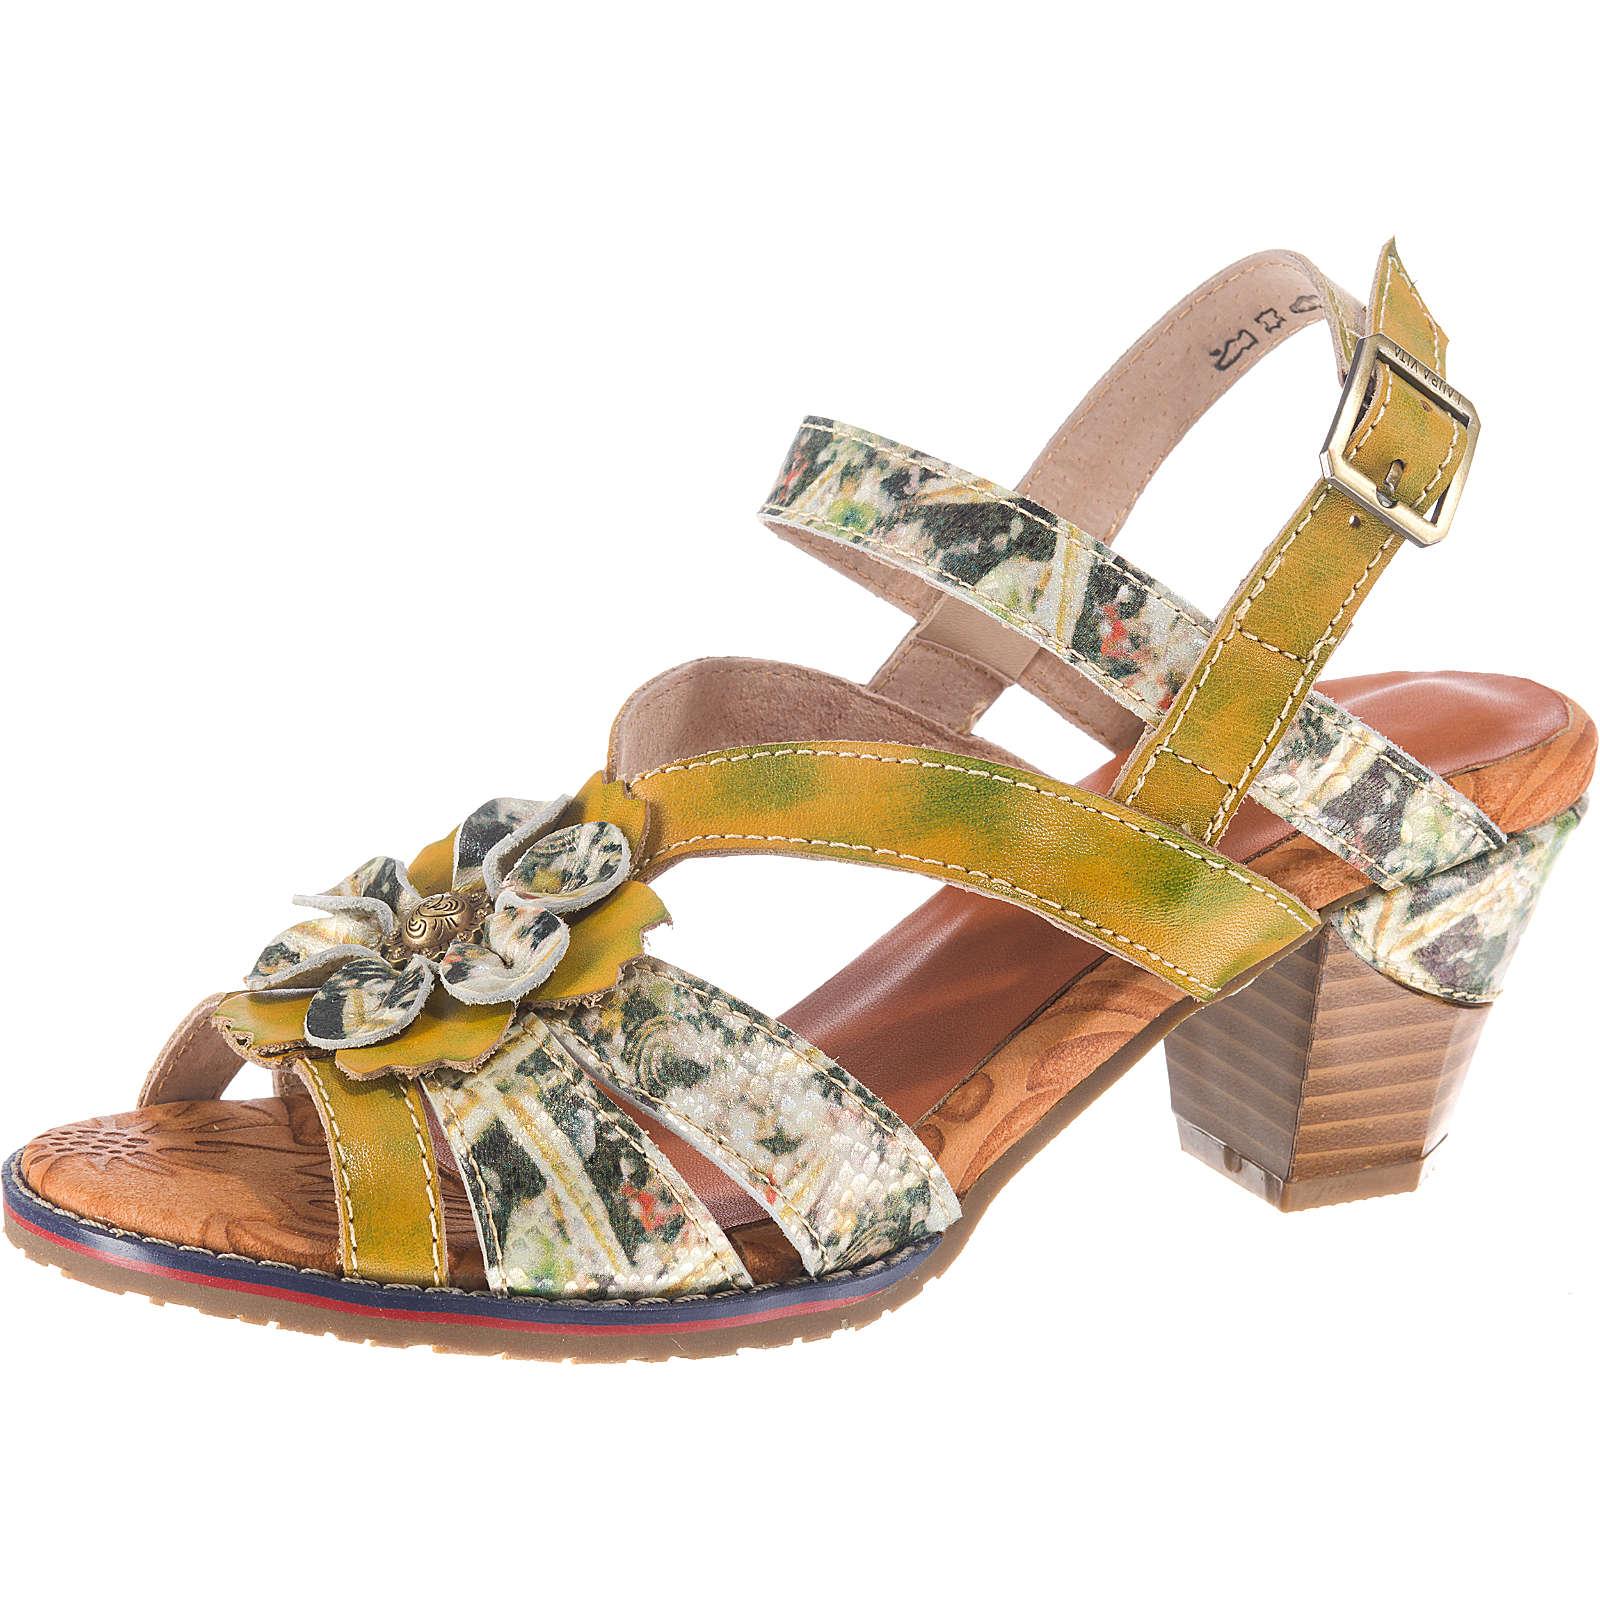 Laura Vita Dream 02 Klassische Sandaletten gelb-kombi Damen Gr. 40